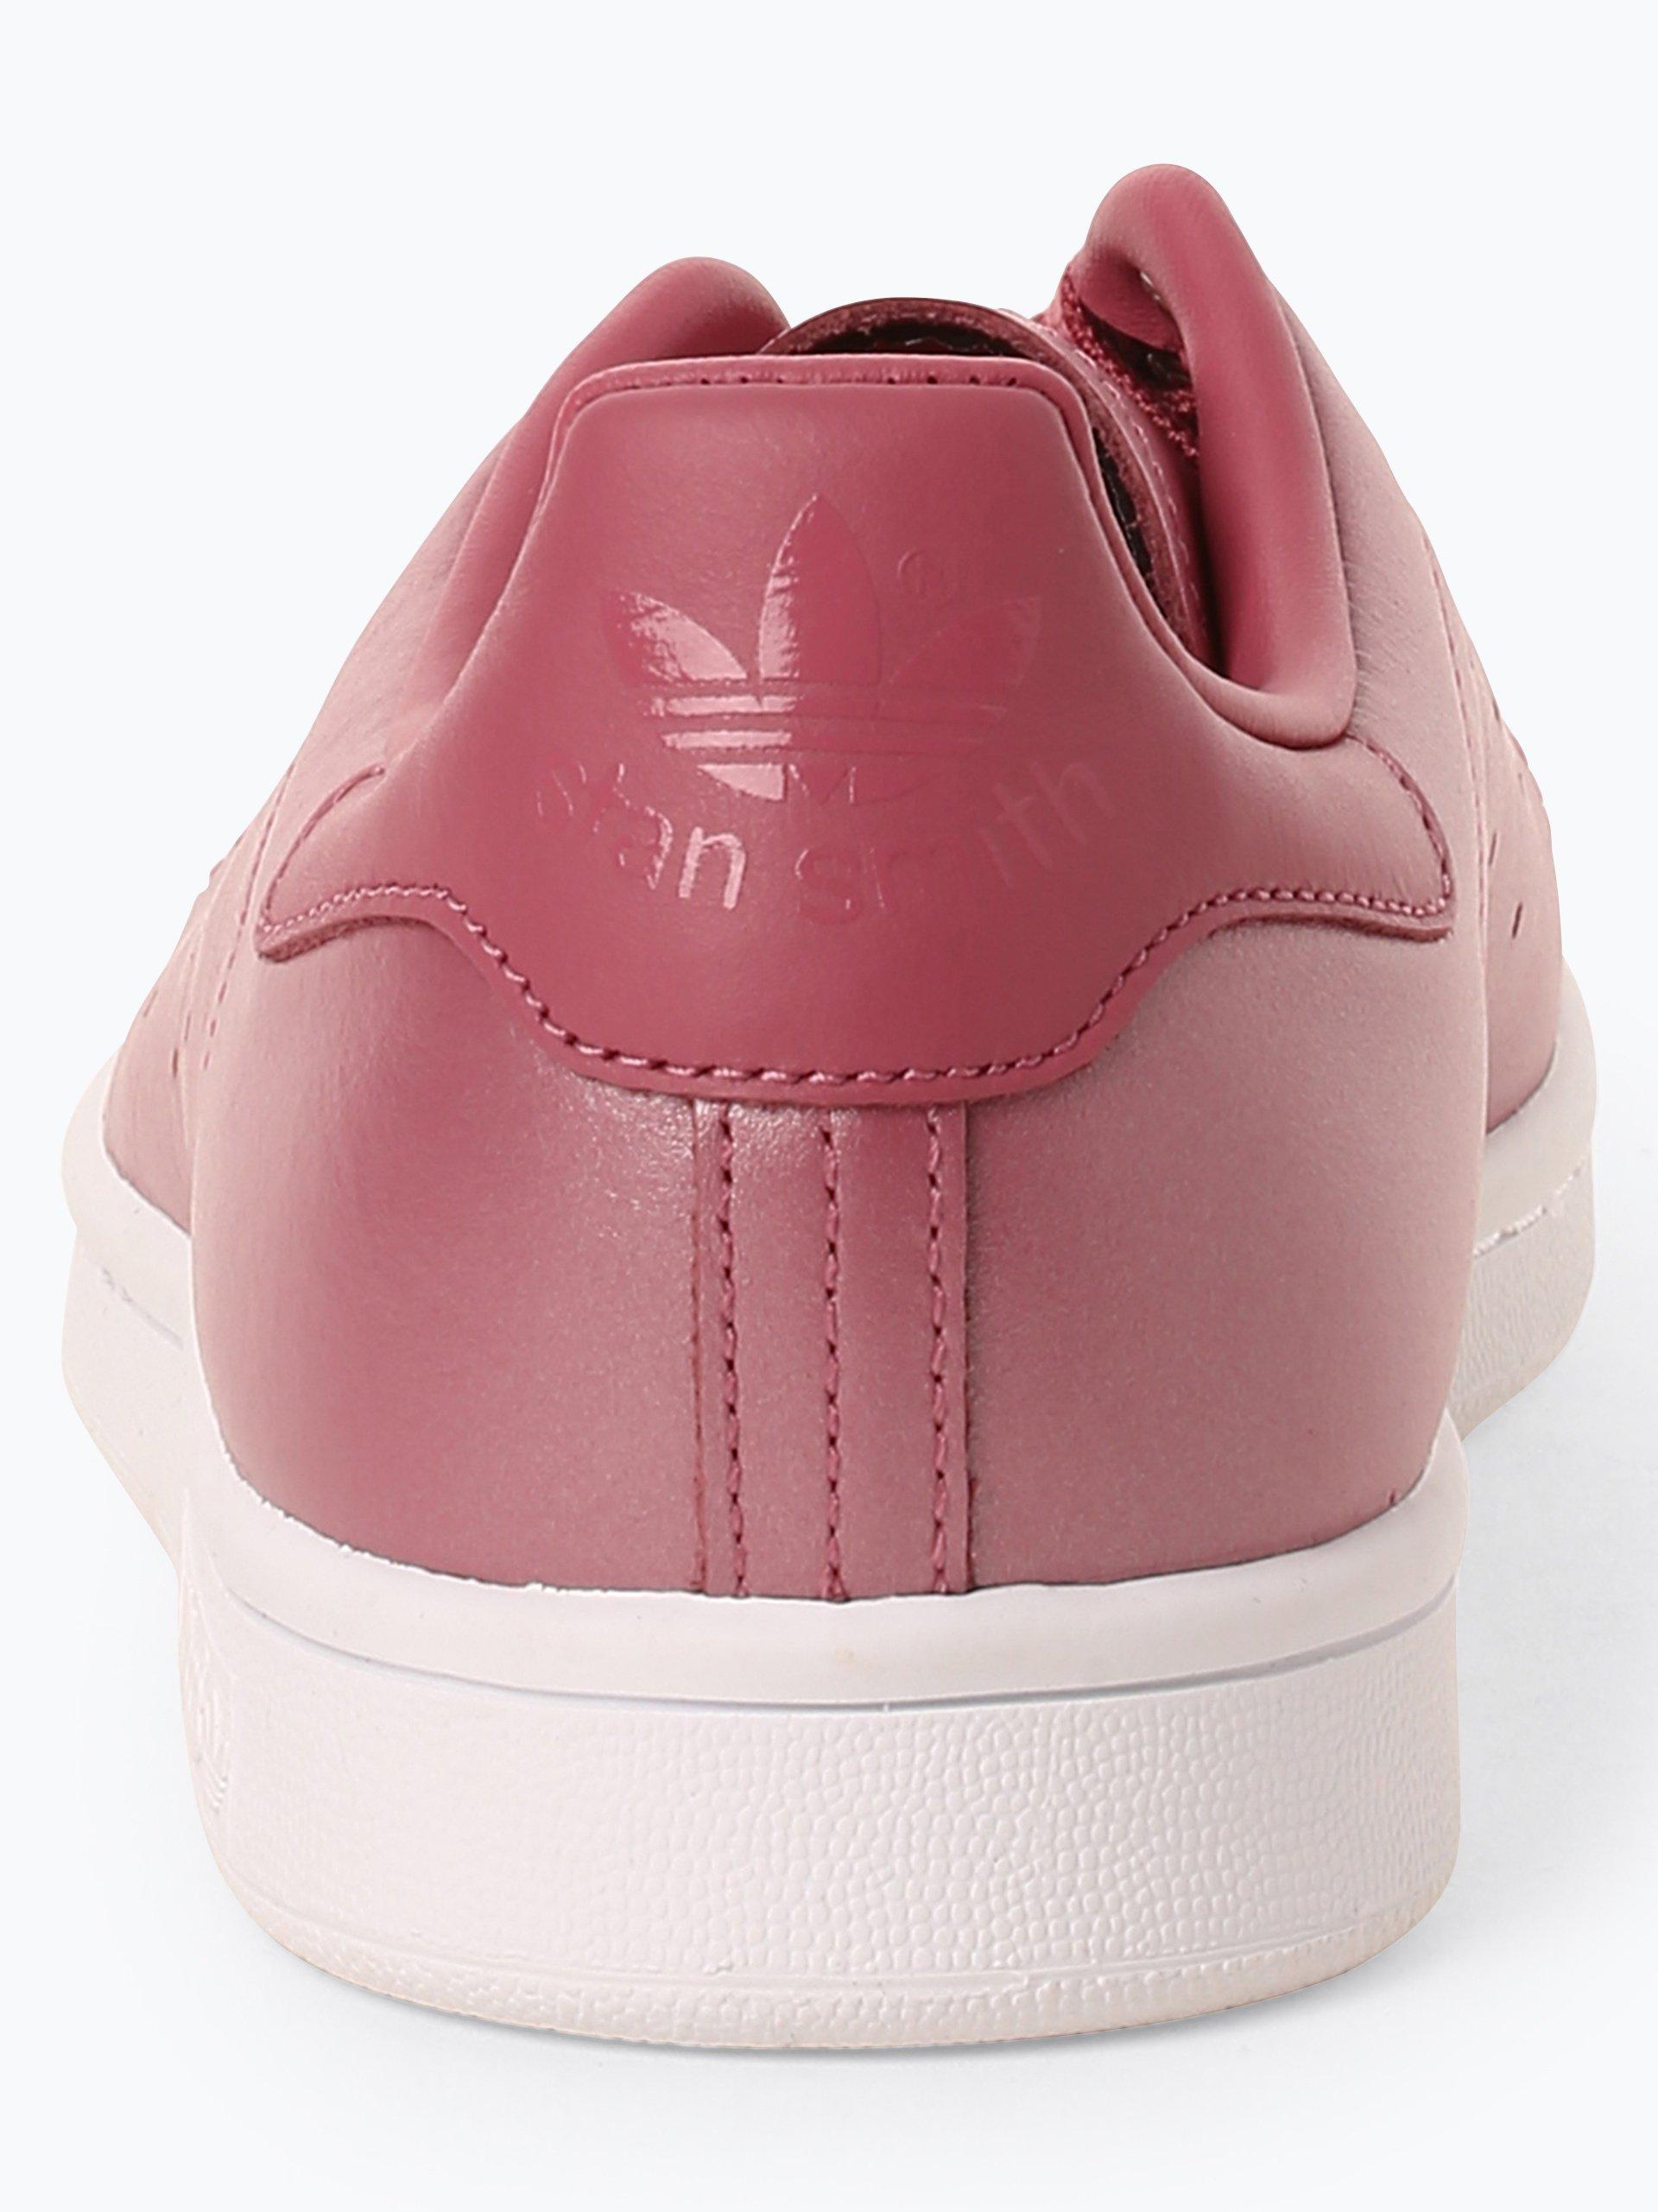 adidas Originals Damen Sneaker aus Leder - Stan Smith